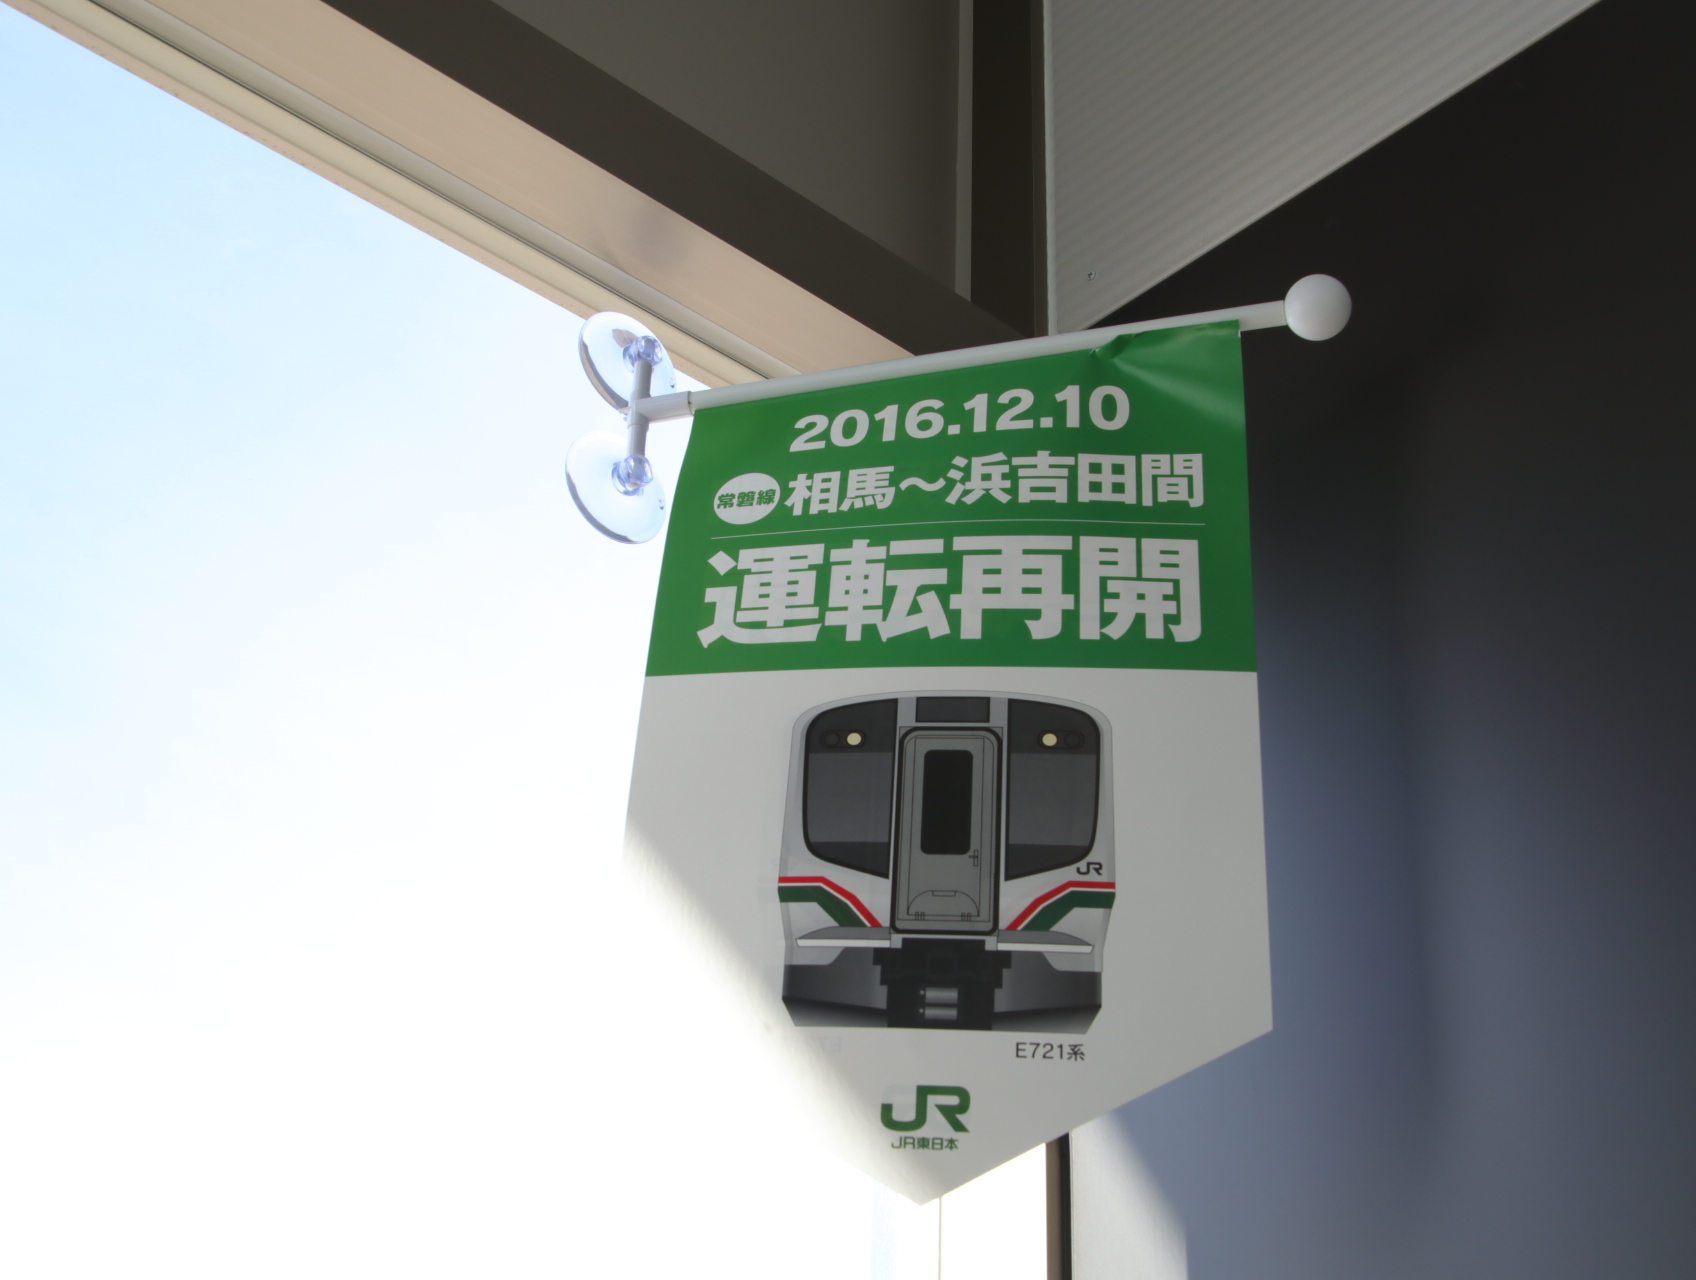 JR新地駅_d0202264_167873.jpg